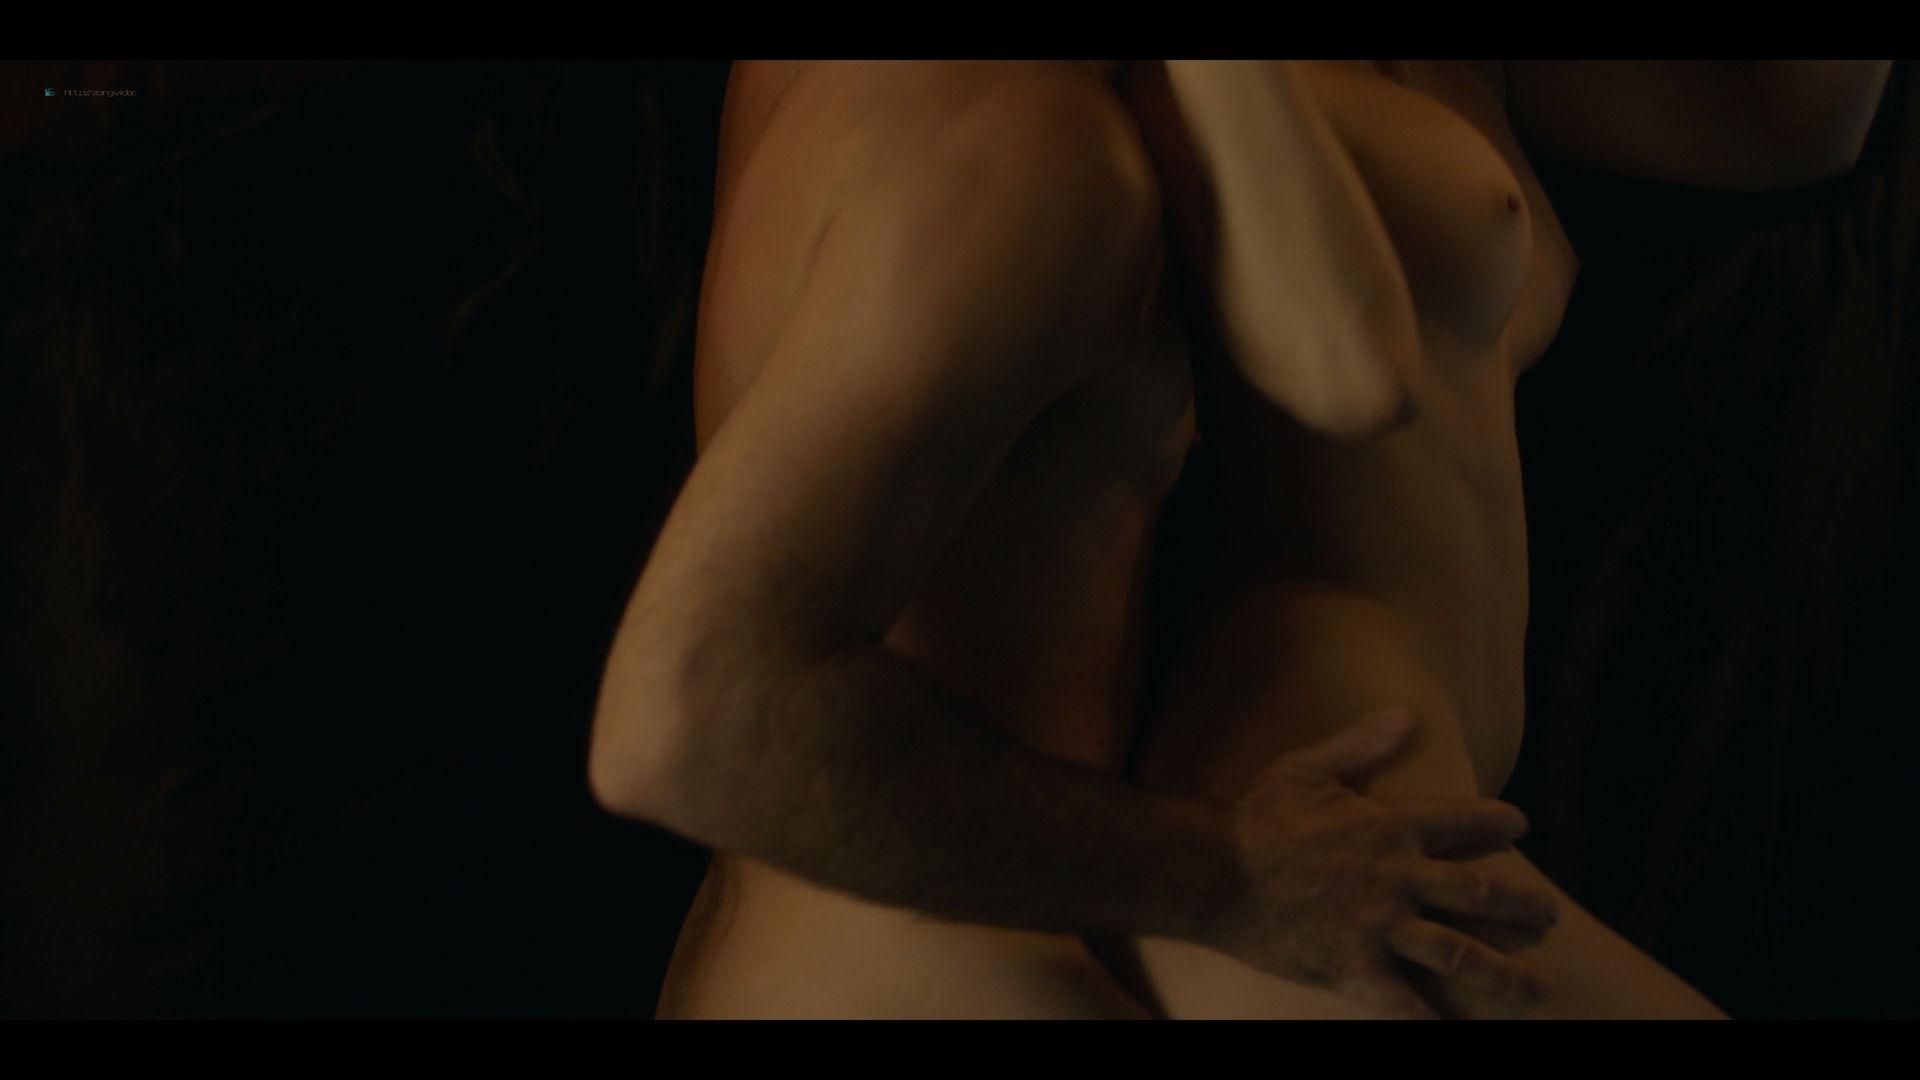 Bella Heathcote nude sex - Strange Angel - (2019) s2e4 HD 1080p (5)